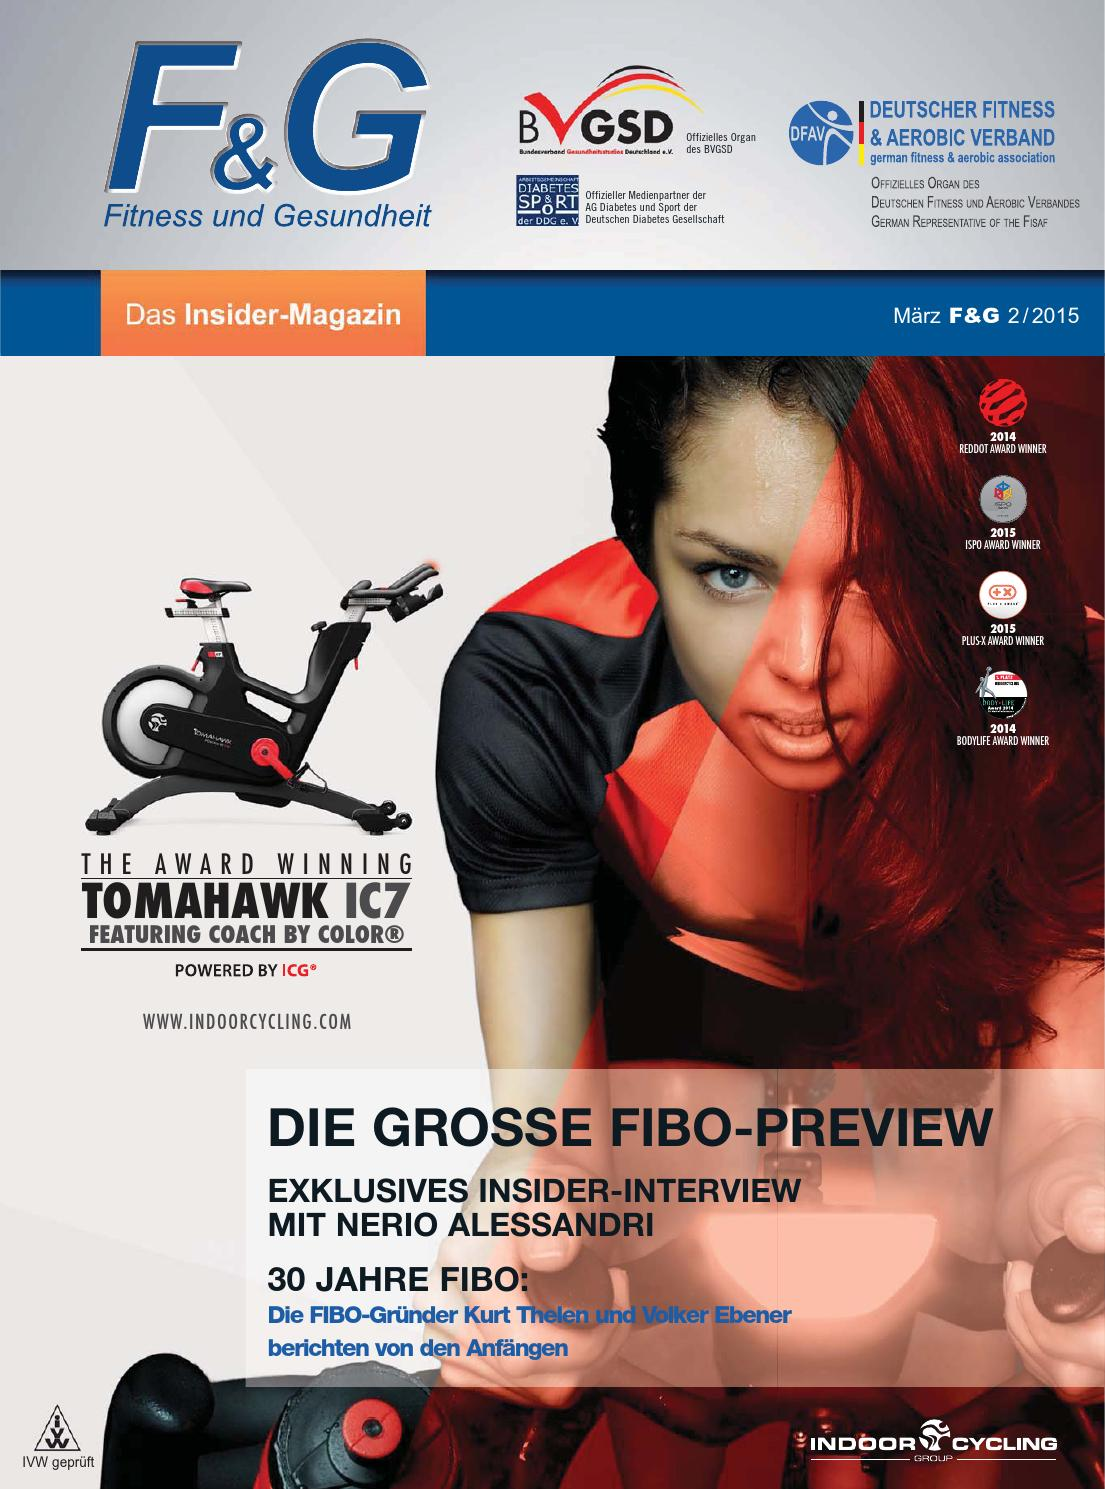 F g 2 15 web opt by Media Verlag Celle GmbH   Co. KG - issuu 9d96a3a12b